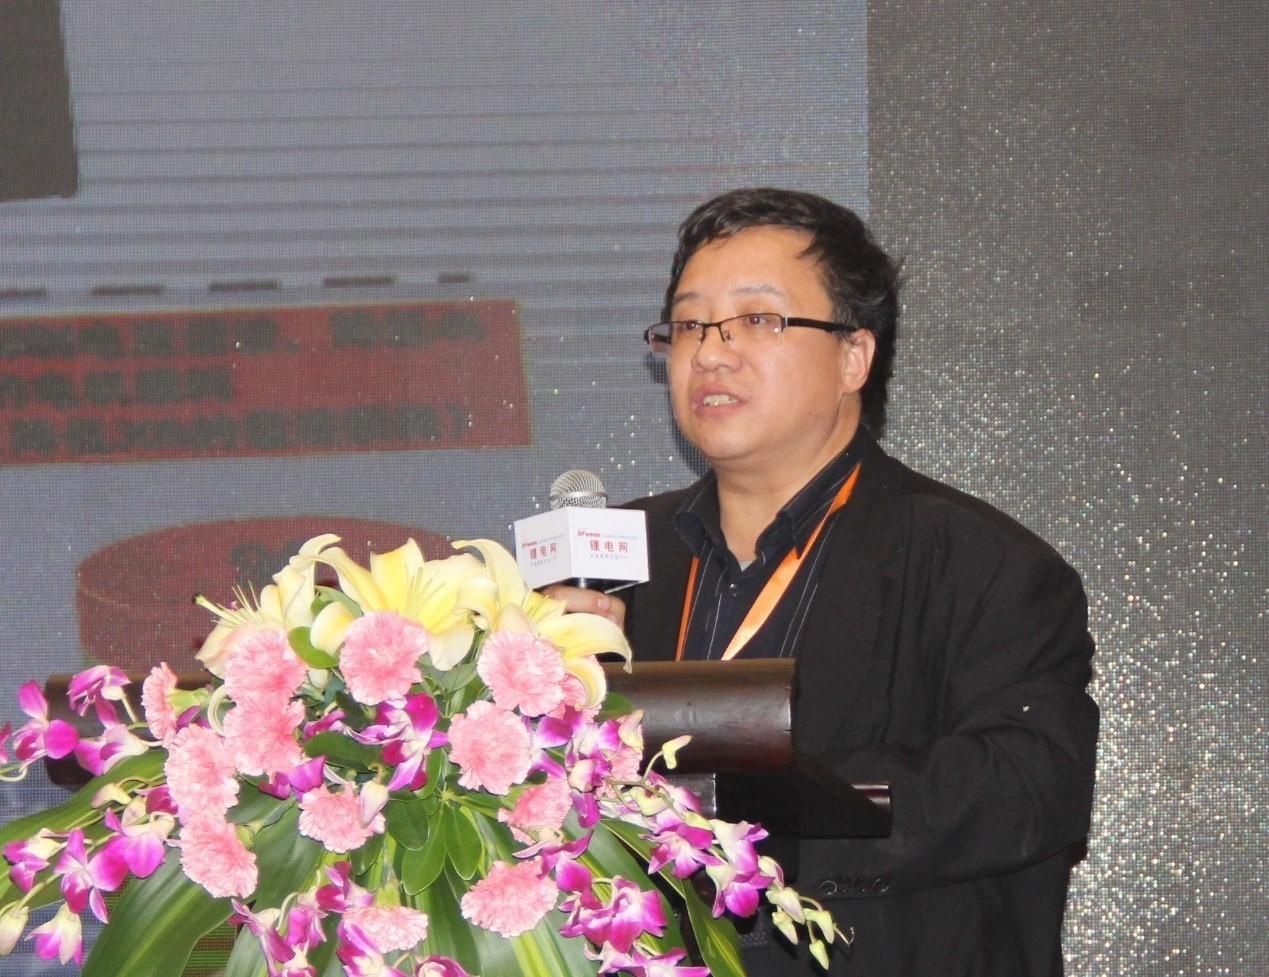 OFweek 2017(第四届)中国锂电产业高峰论坛成功举办